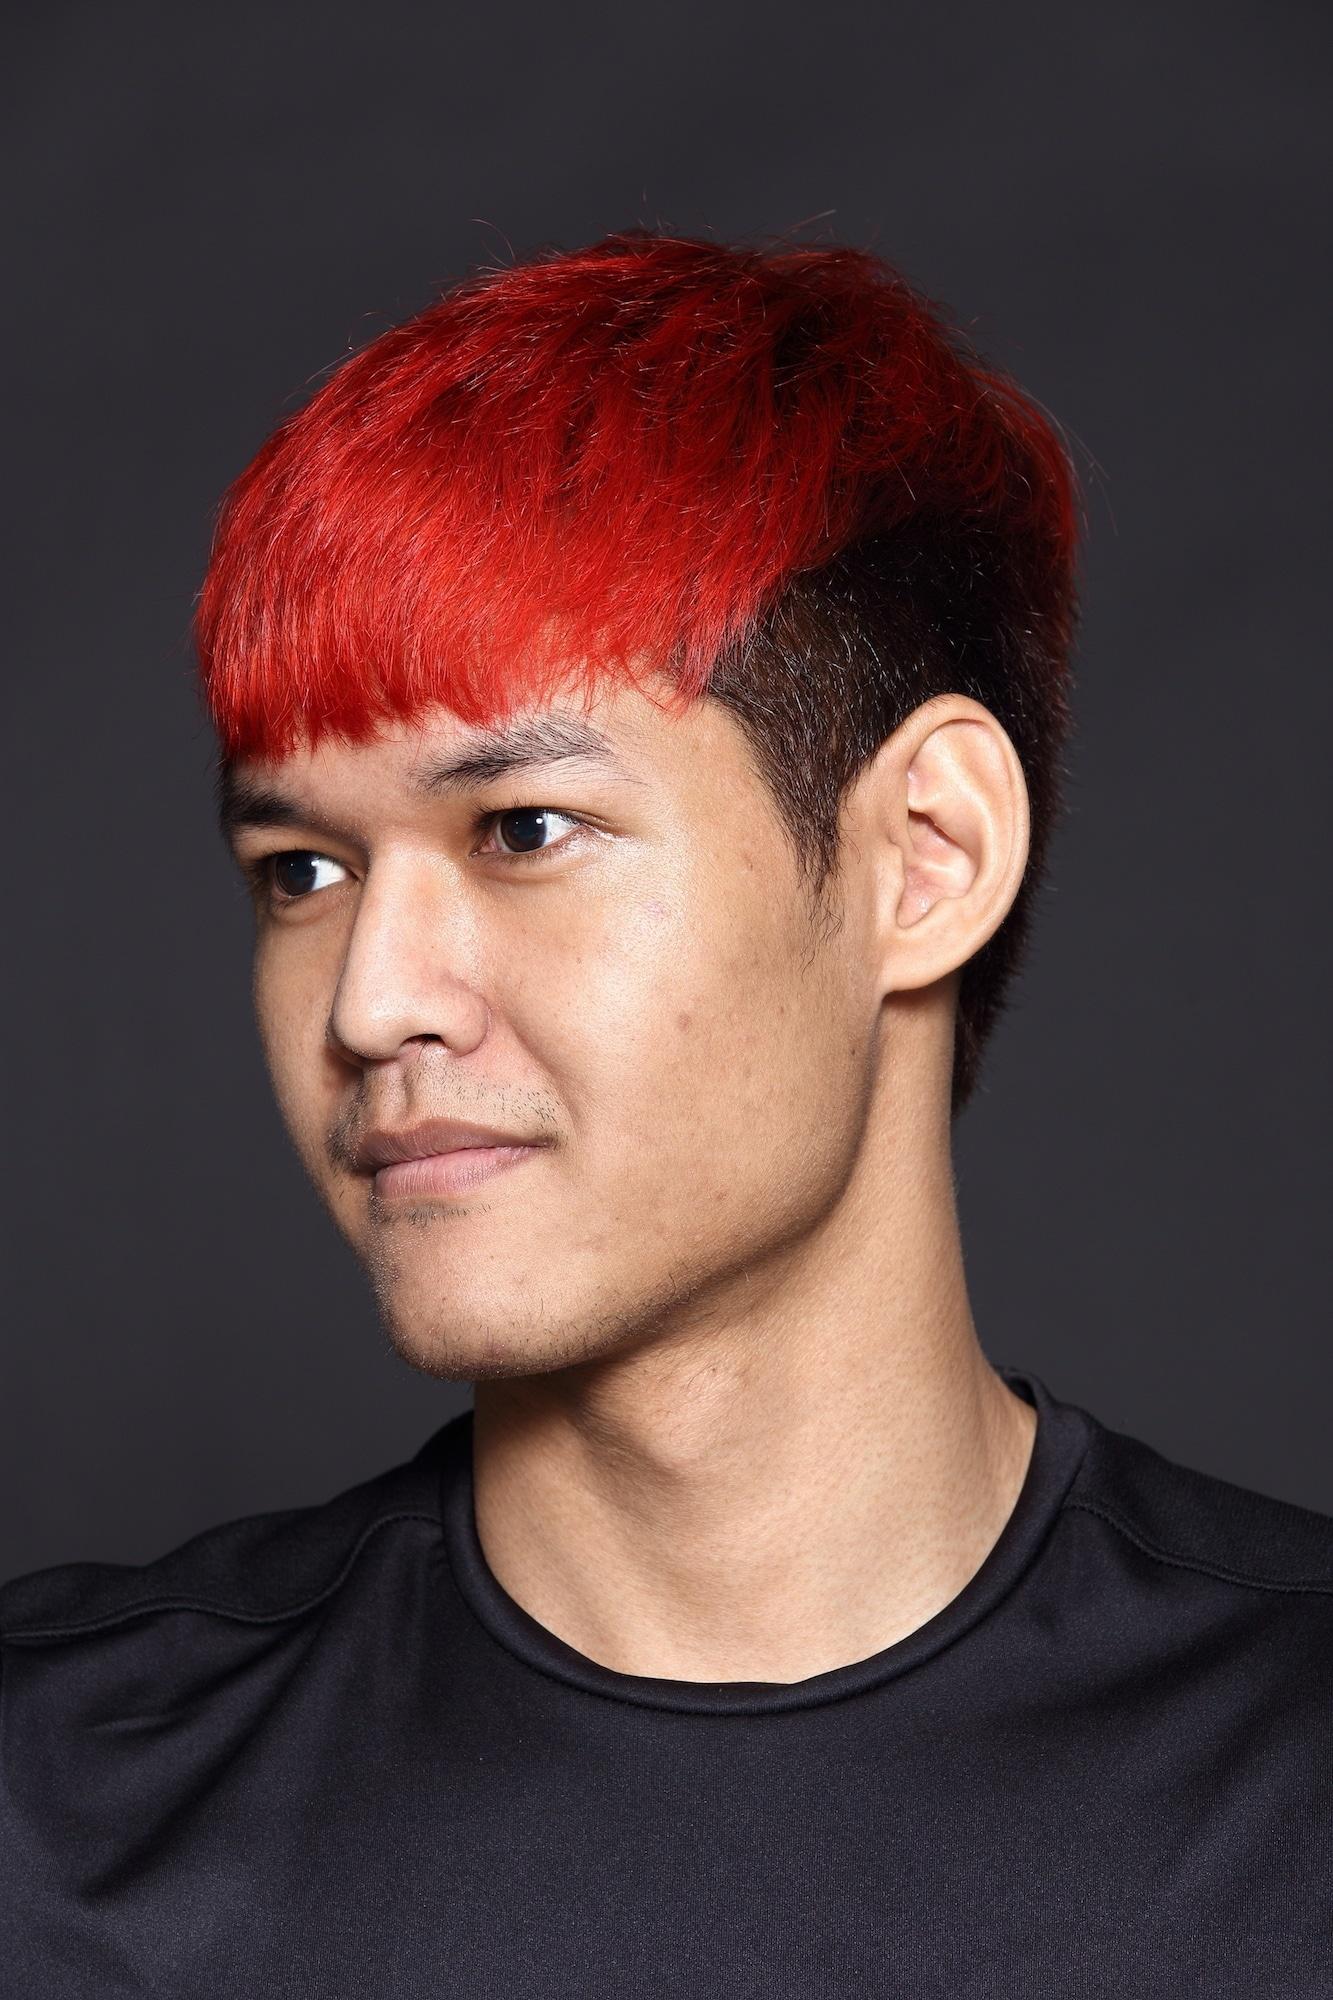 Trend warna rambut pria 2018 warna rambut merah.